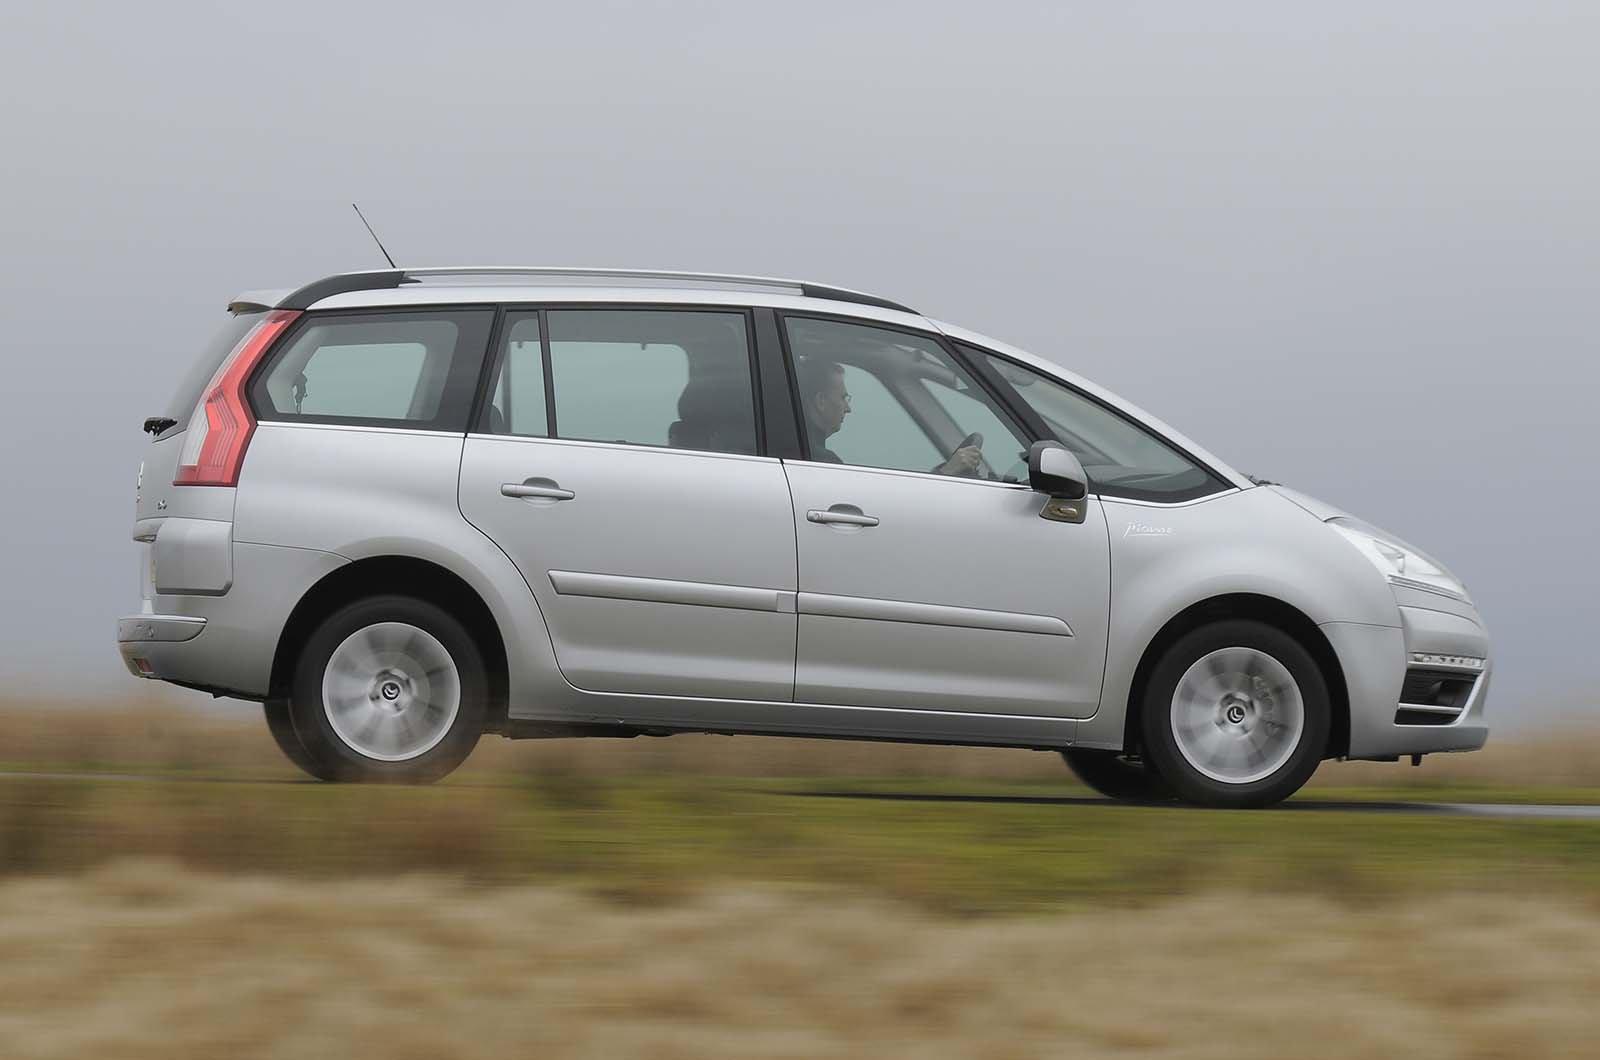 Used Citroën Grand C4 Picasso 2007 - 2013